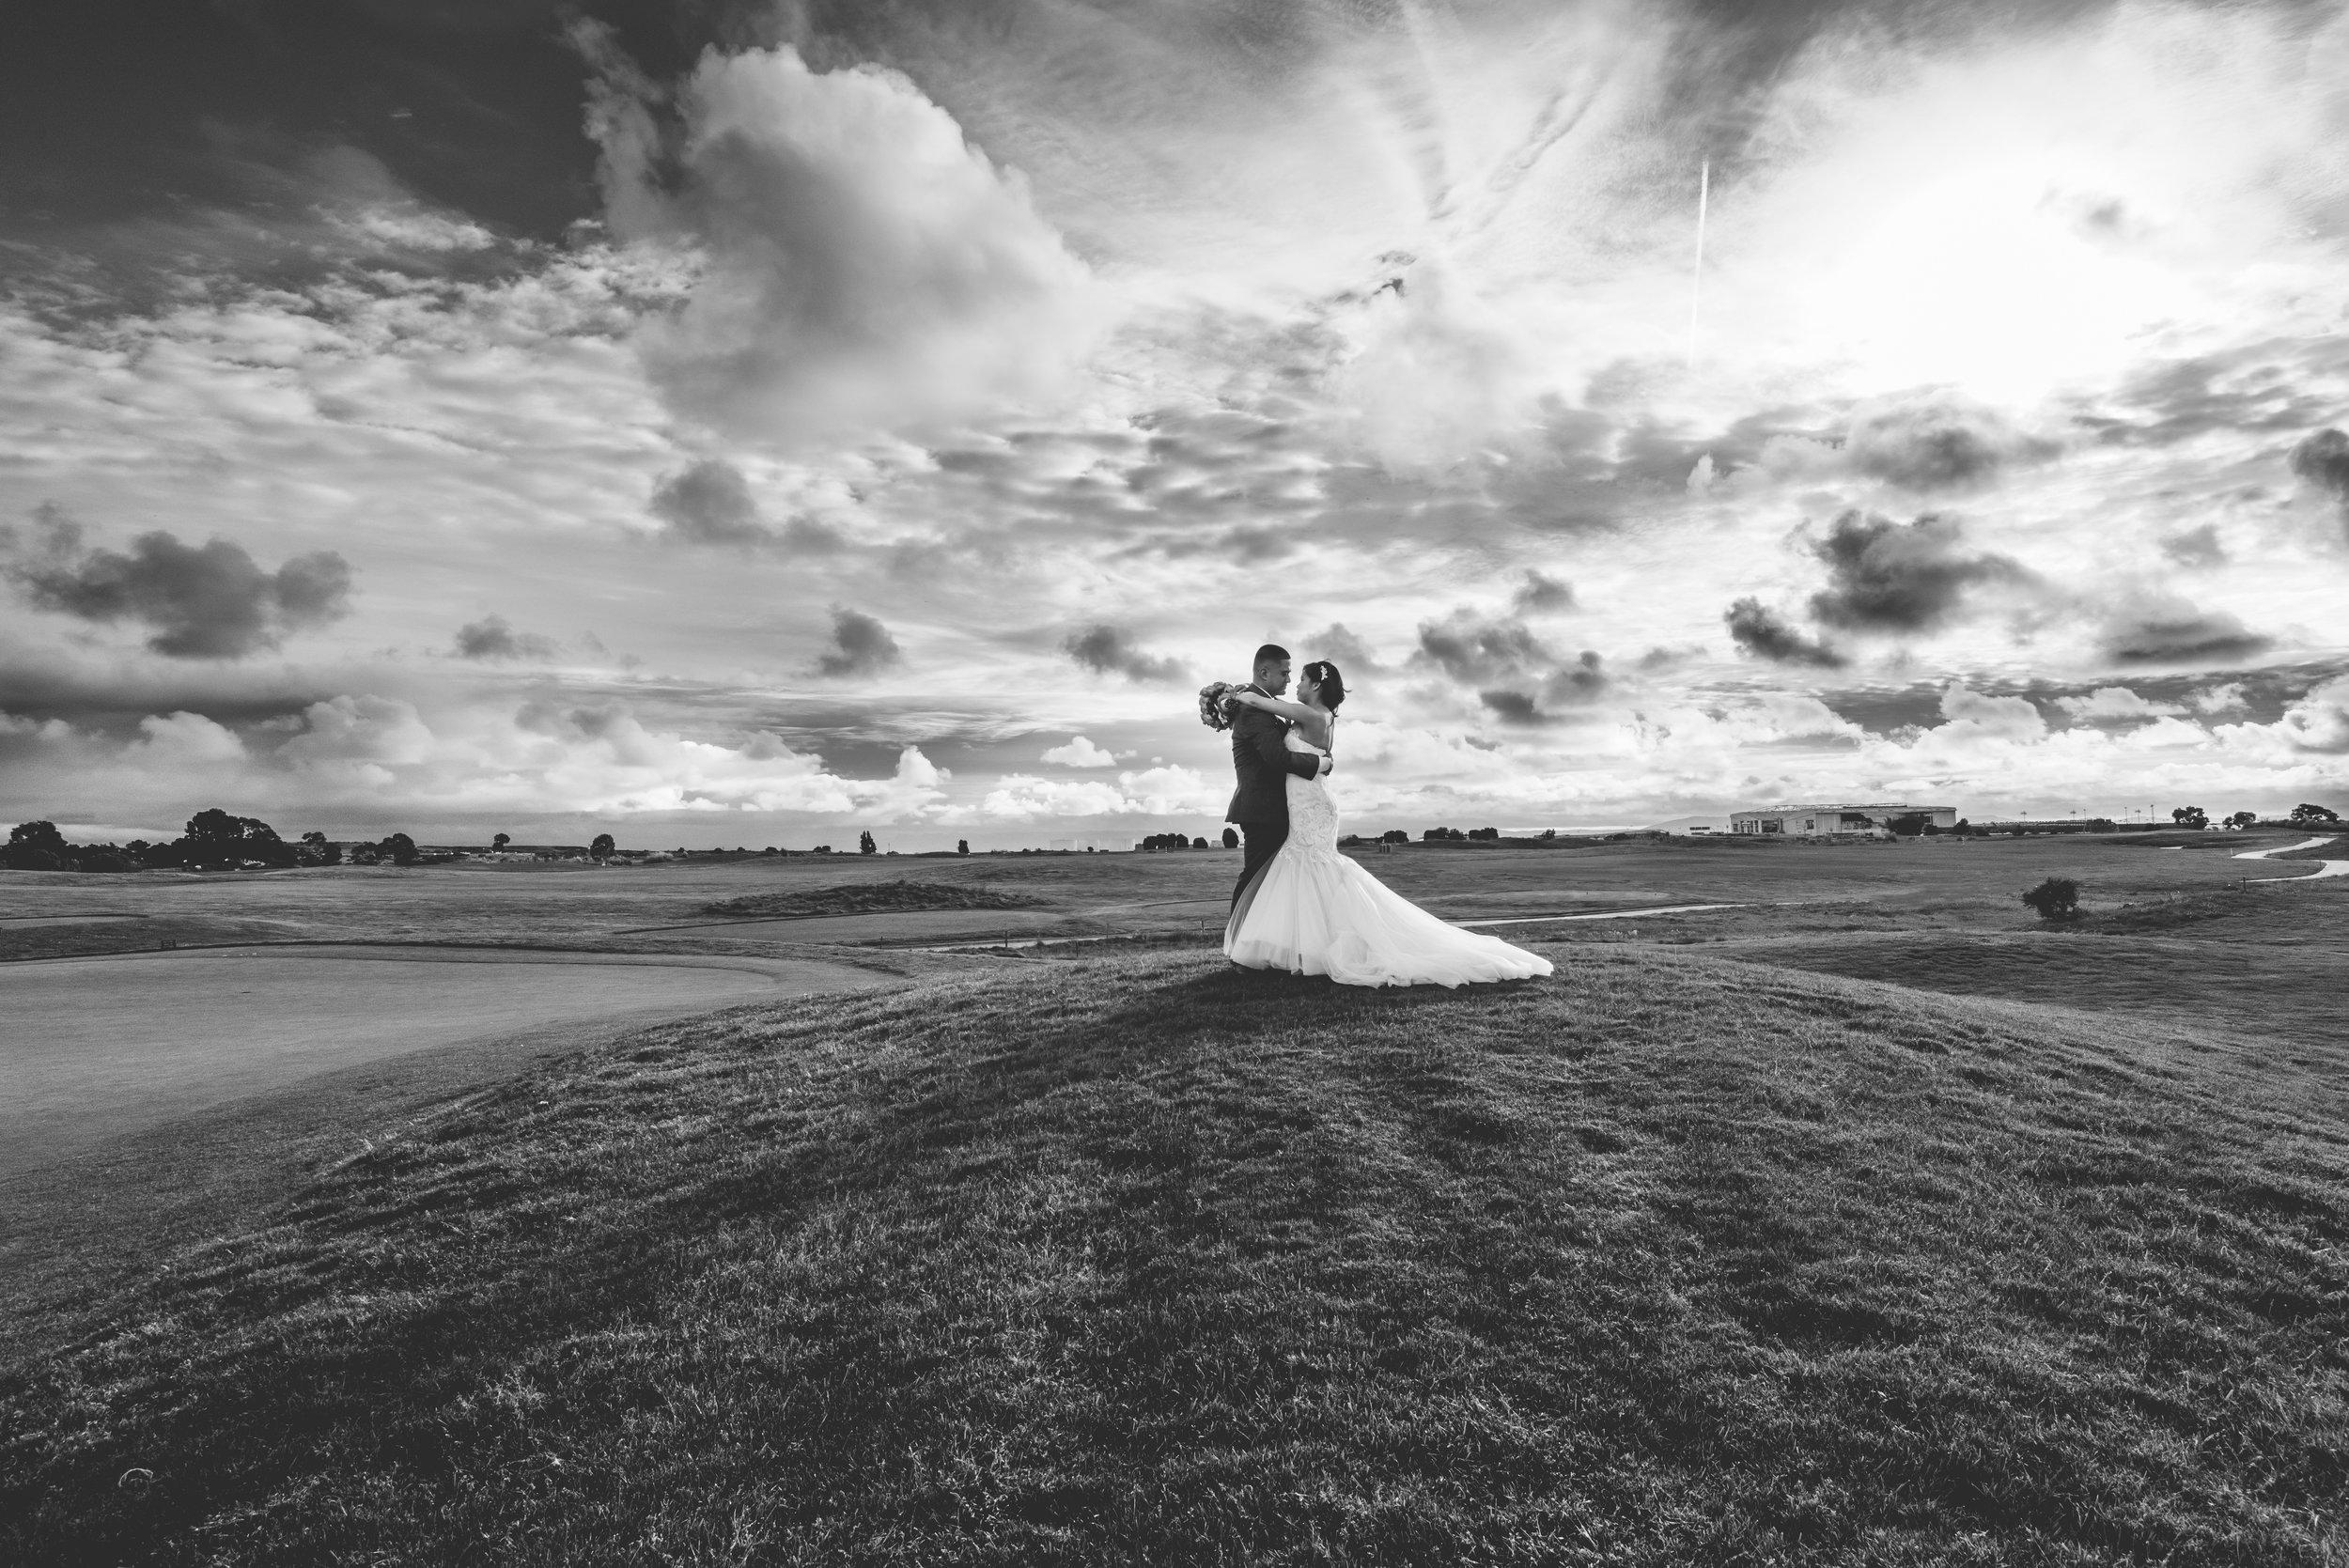 leano-wedding-bride-and-groom-portraits-31.jpg